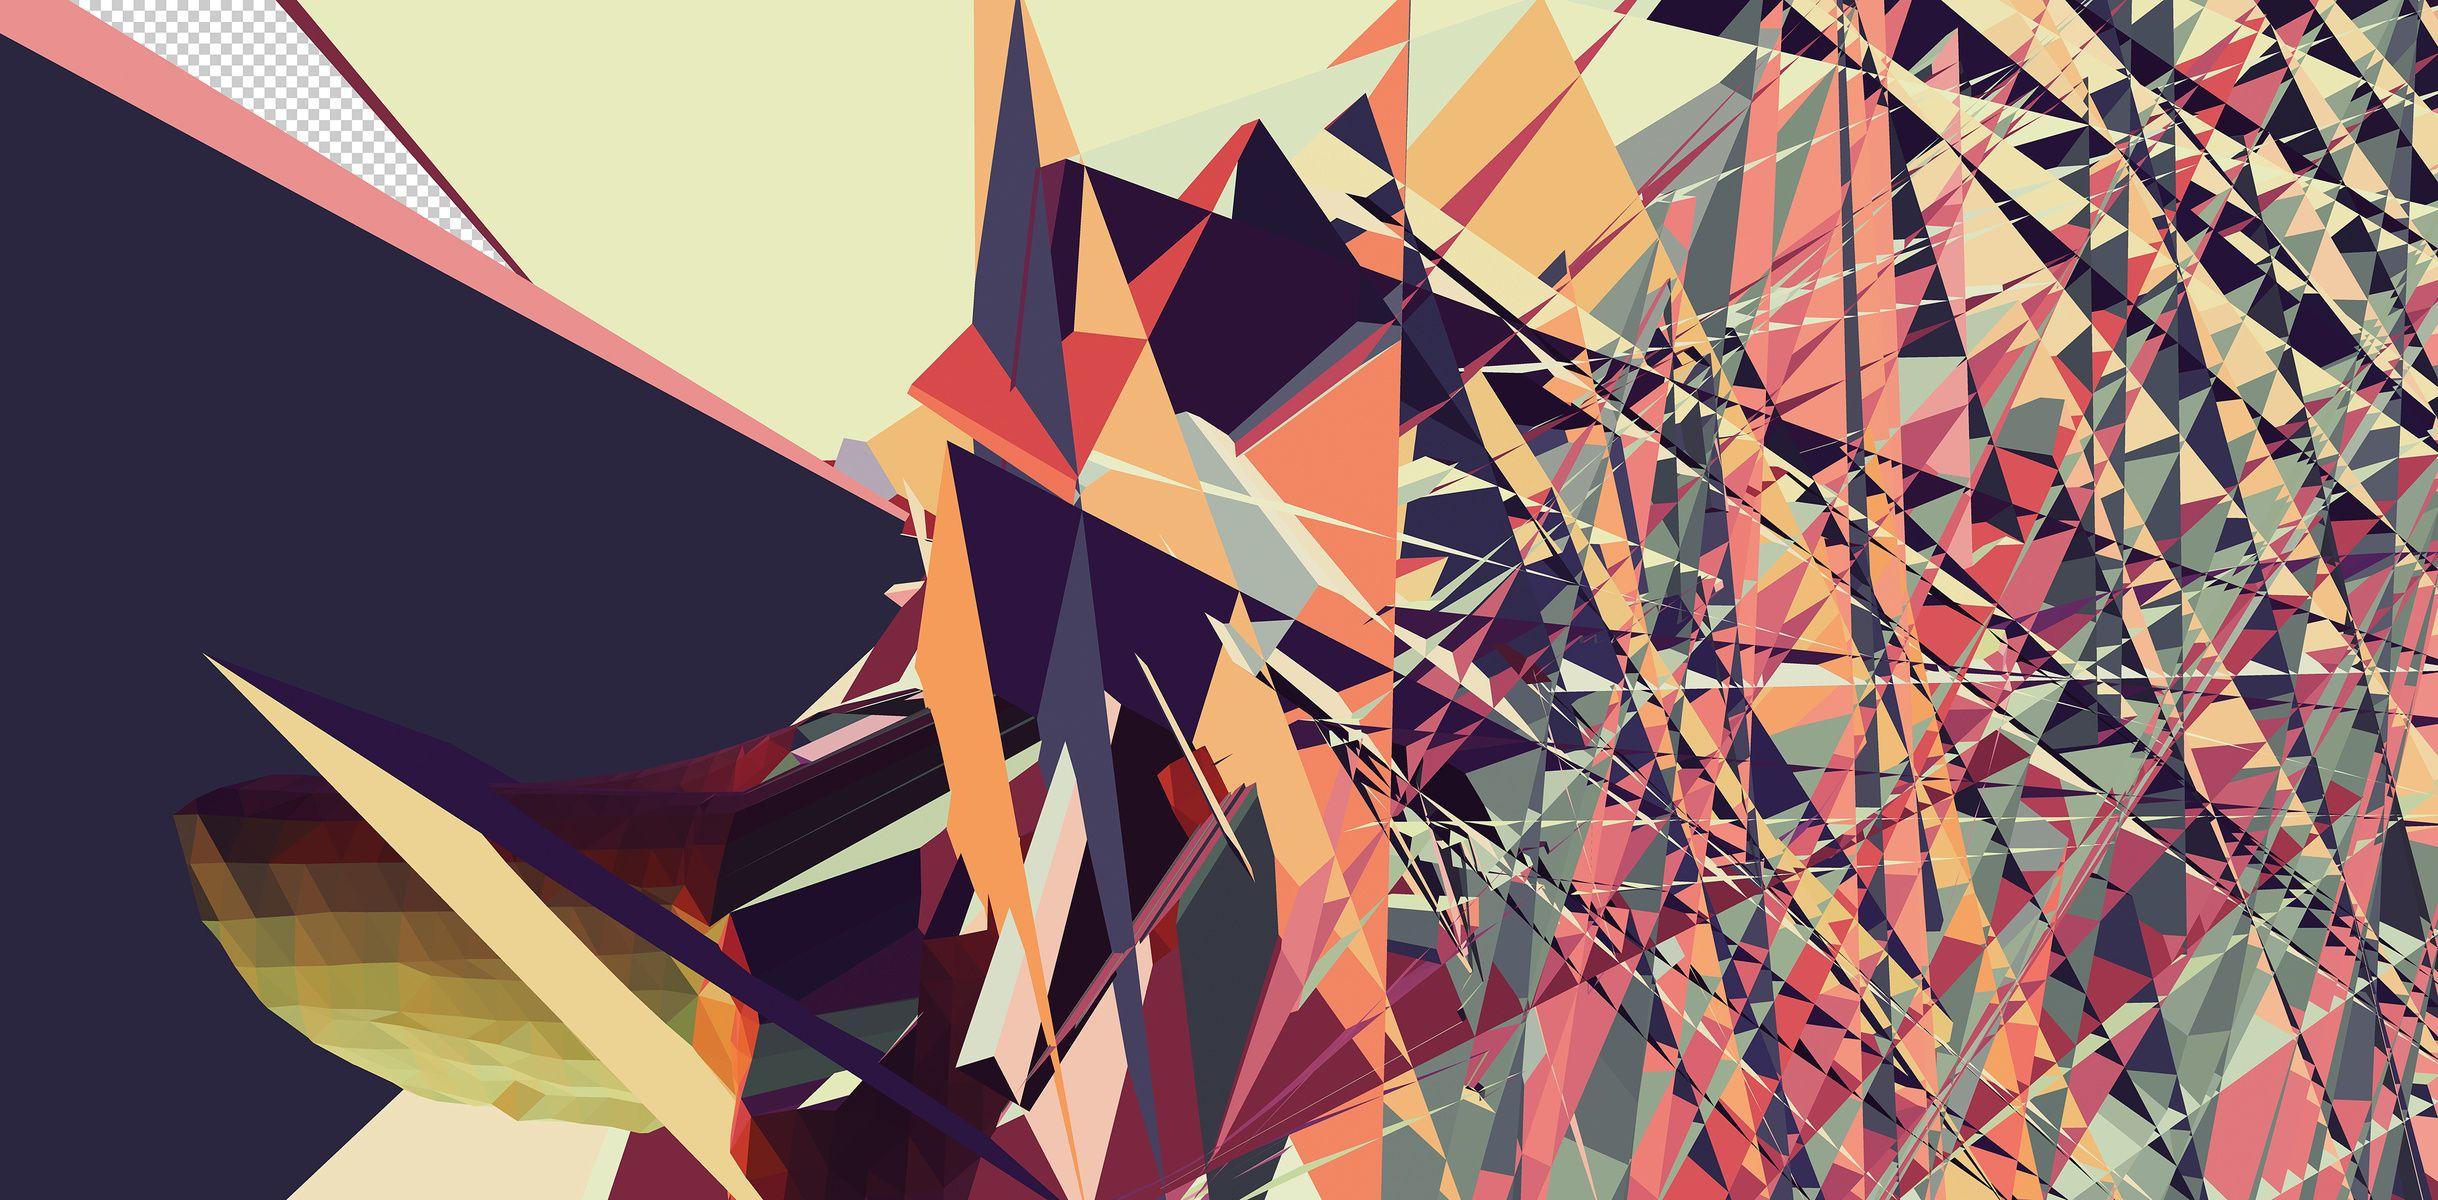 Sabato Visconti / Photographer, Glitch Artist, Illustrator - 3D Modeling Databending Experiments